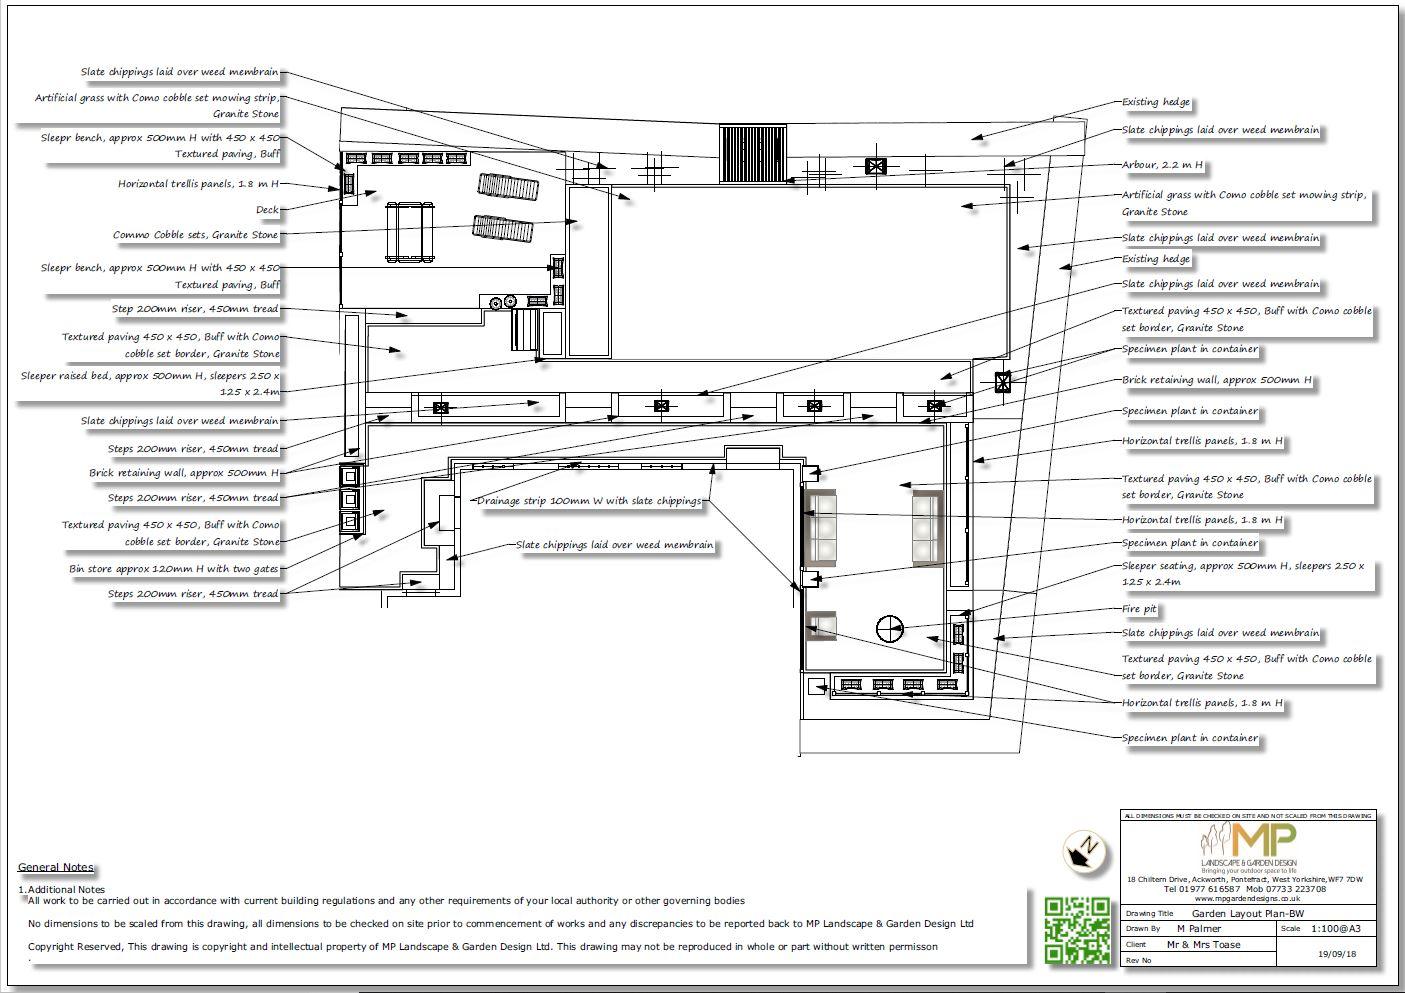 Garden design layout plan black and white for a rear garden in Wakefield